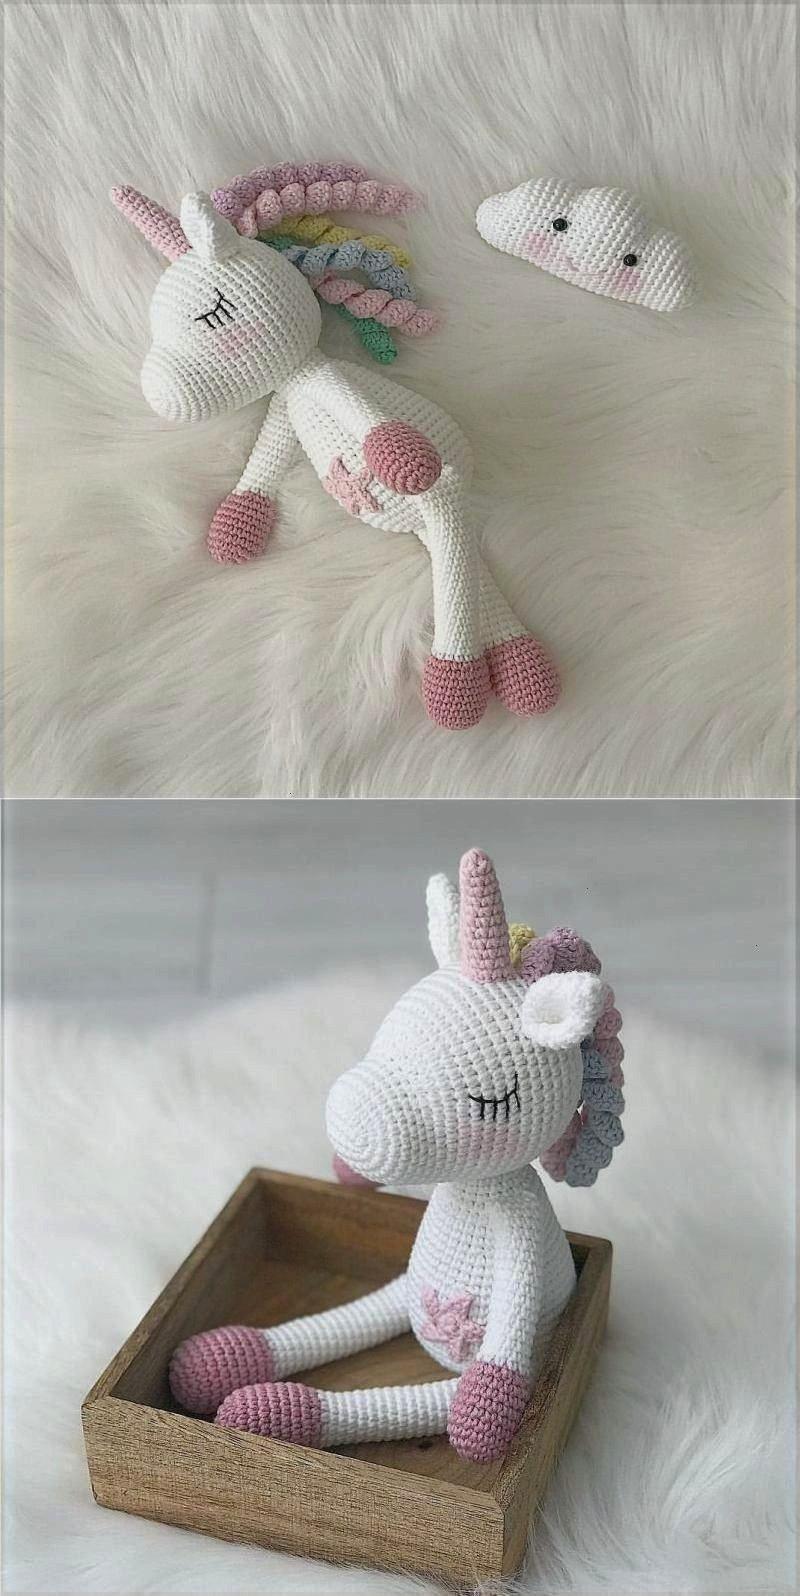 pony Crochet horse pink pony Brown Sheep Amigurumi crochet animal nursery gift baby shower b Crochet pony Crochet horse pink pony Brown Sheep Amigurumi crochet animal nur...